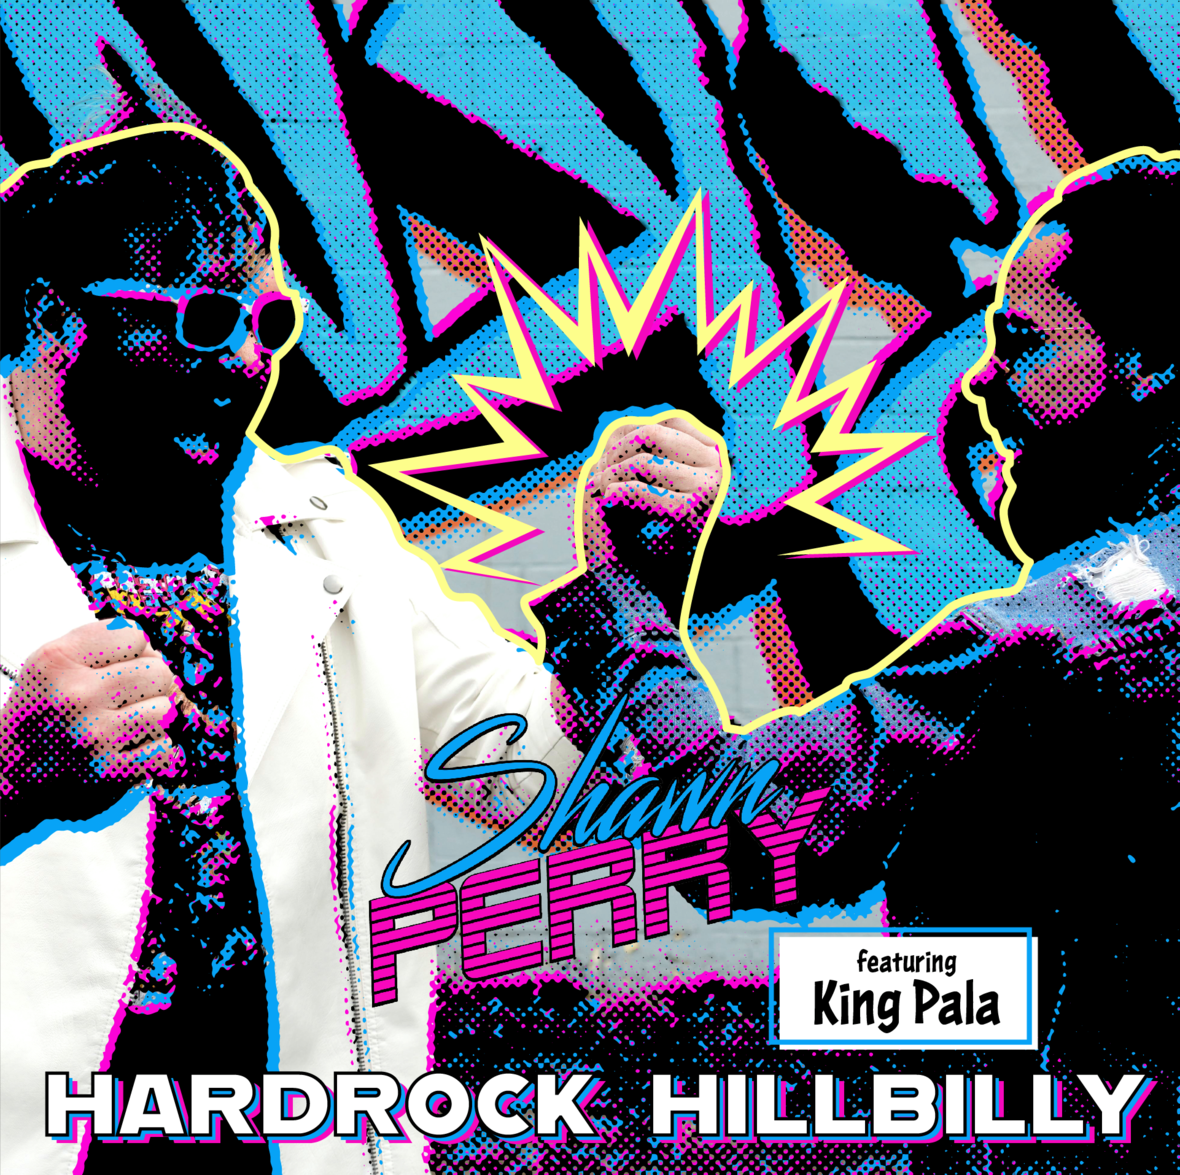 hard rock hillbilly single cover